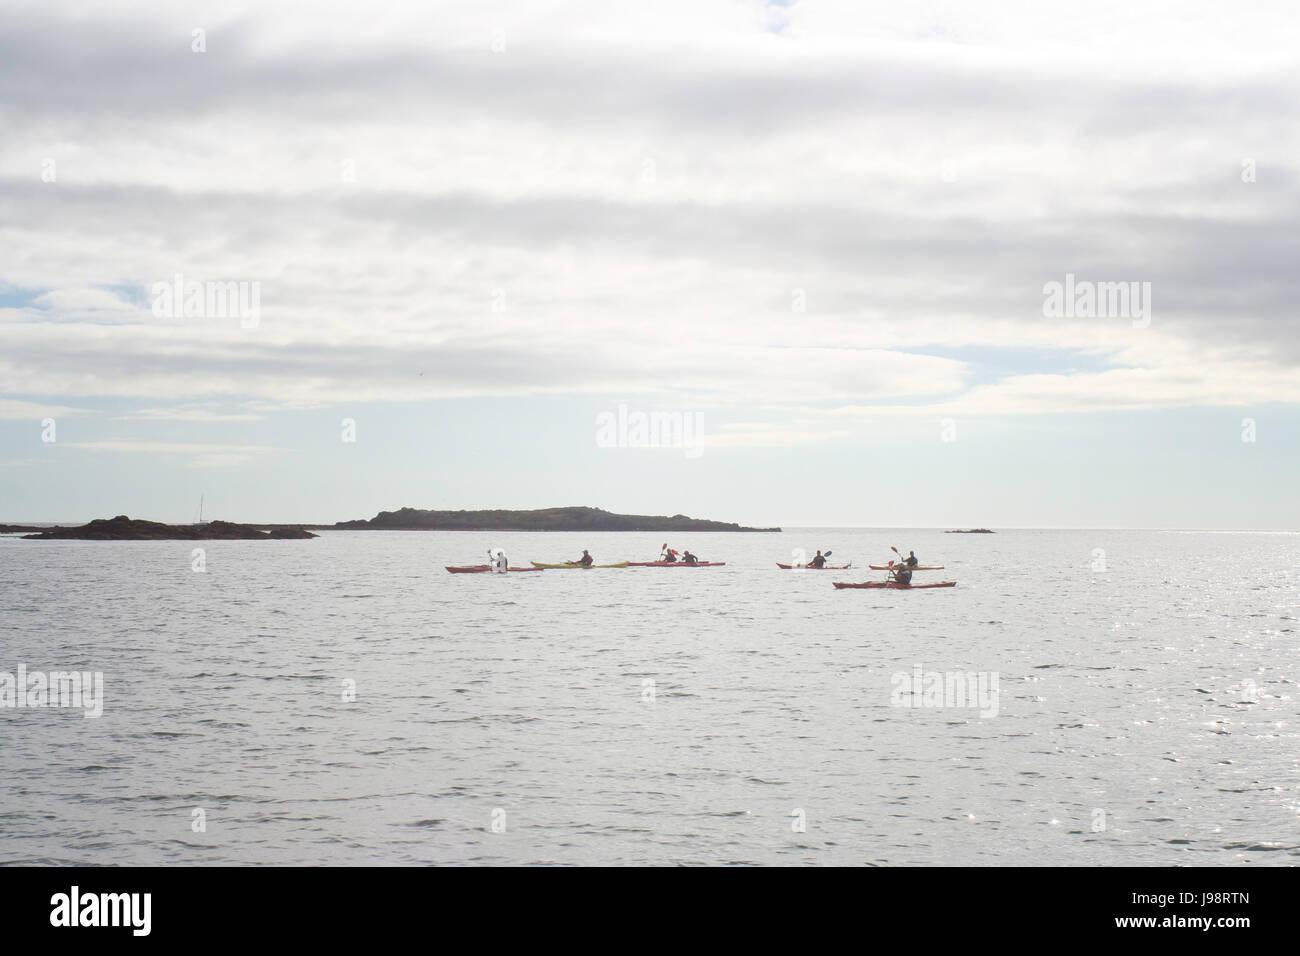 Group Kayaking in Dublin Bay, Ireland - Stock Image